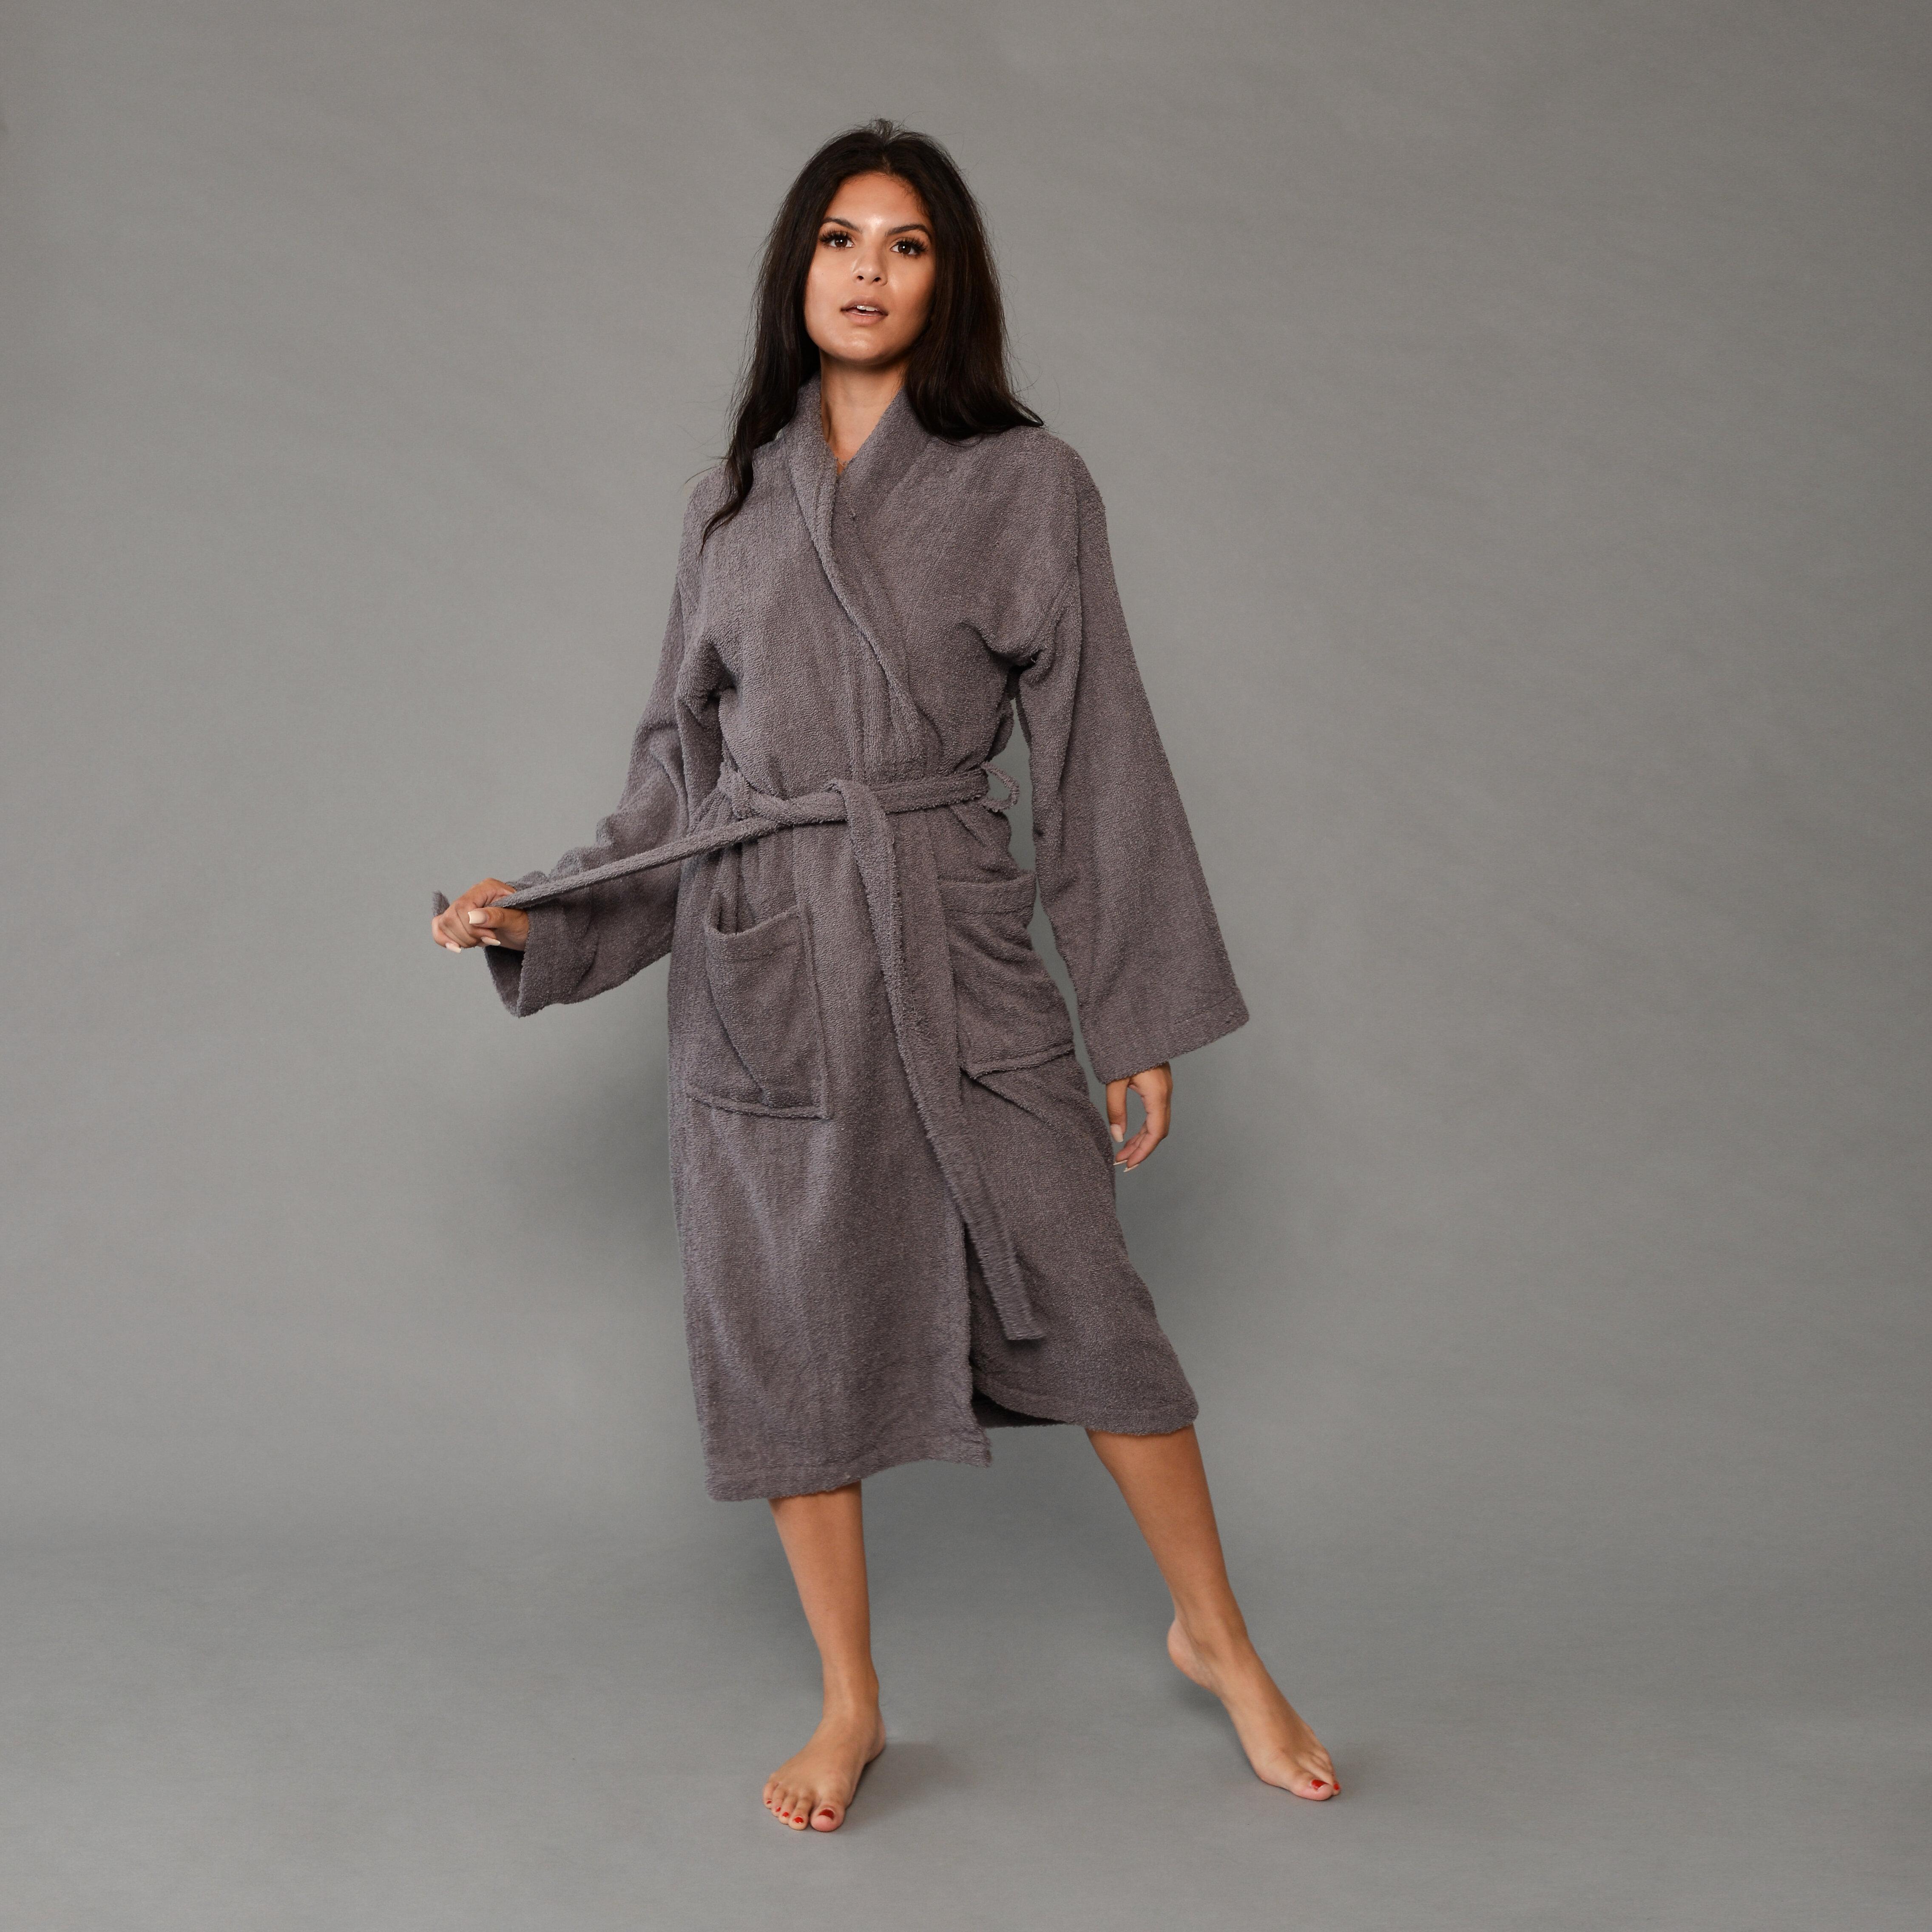 Dressing Gowns Robes Bath Robes Wayfair Co Uk